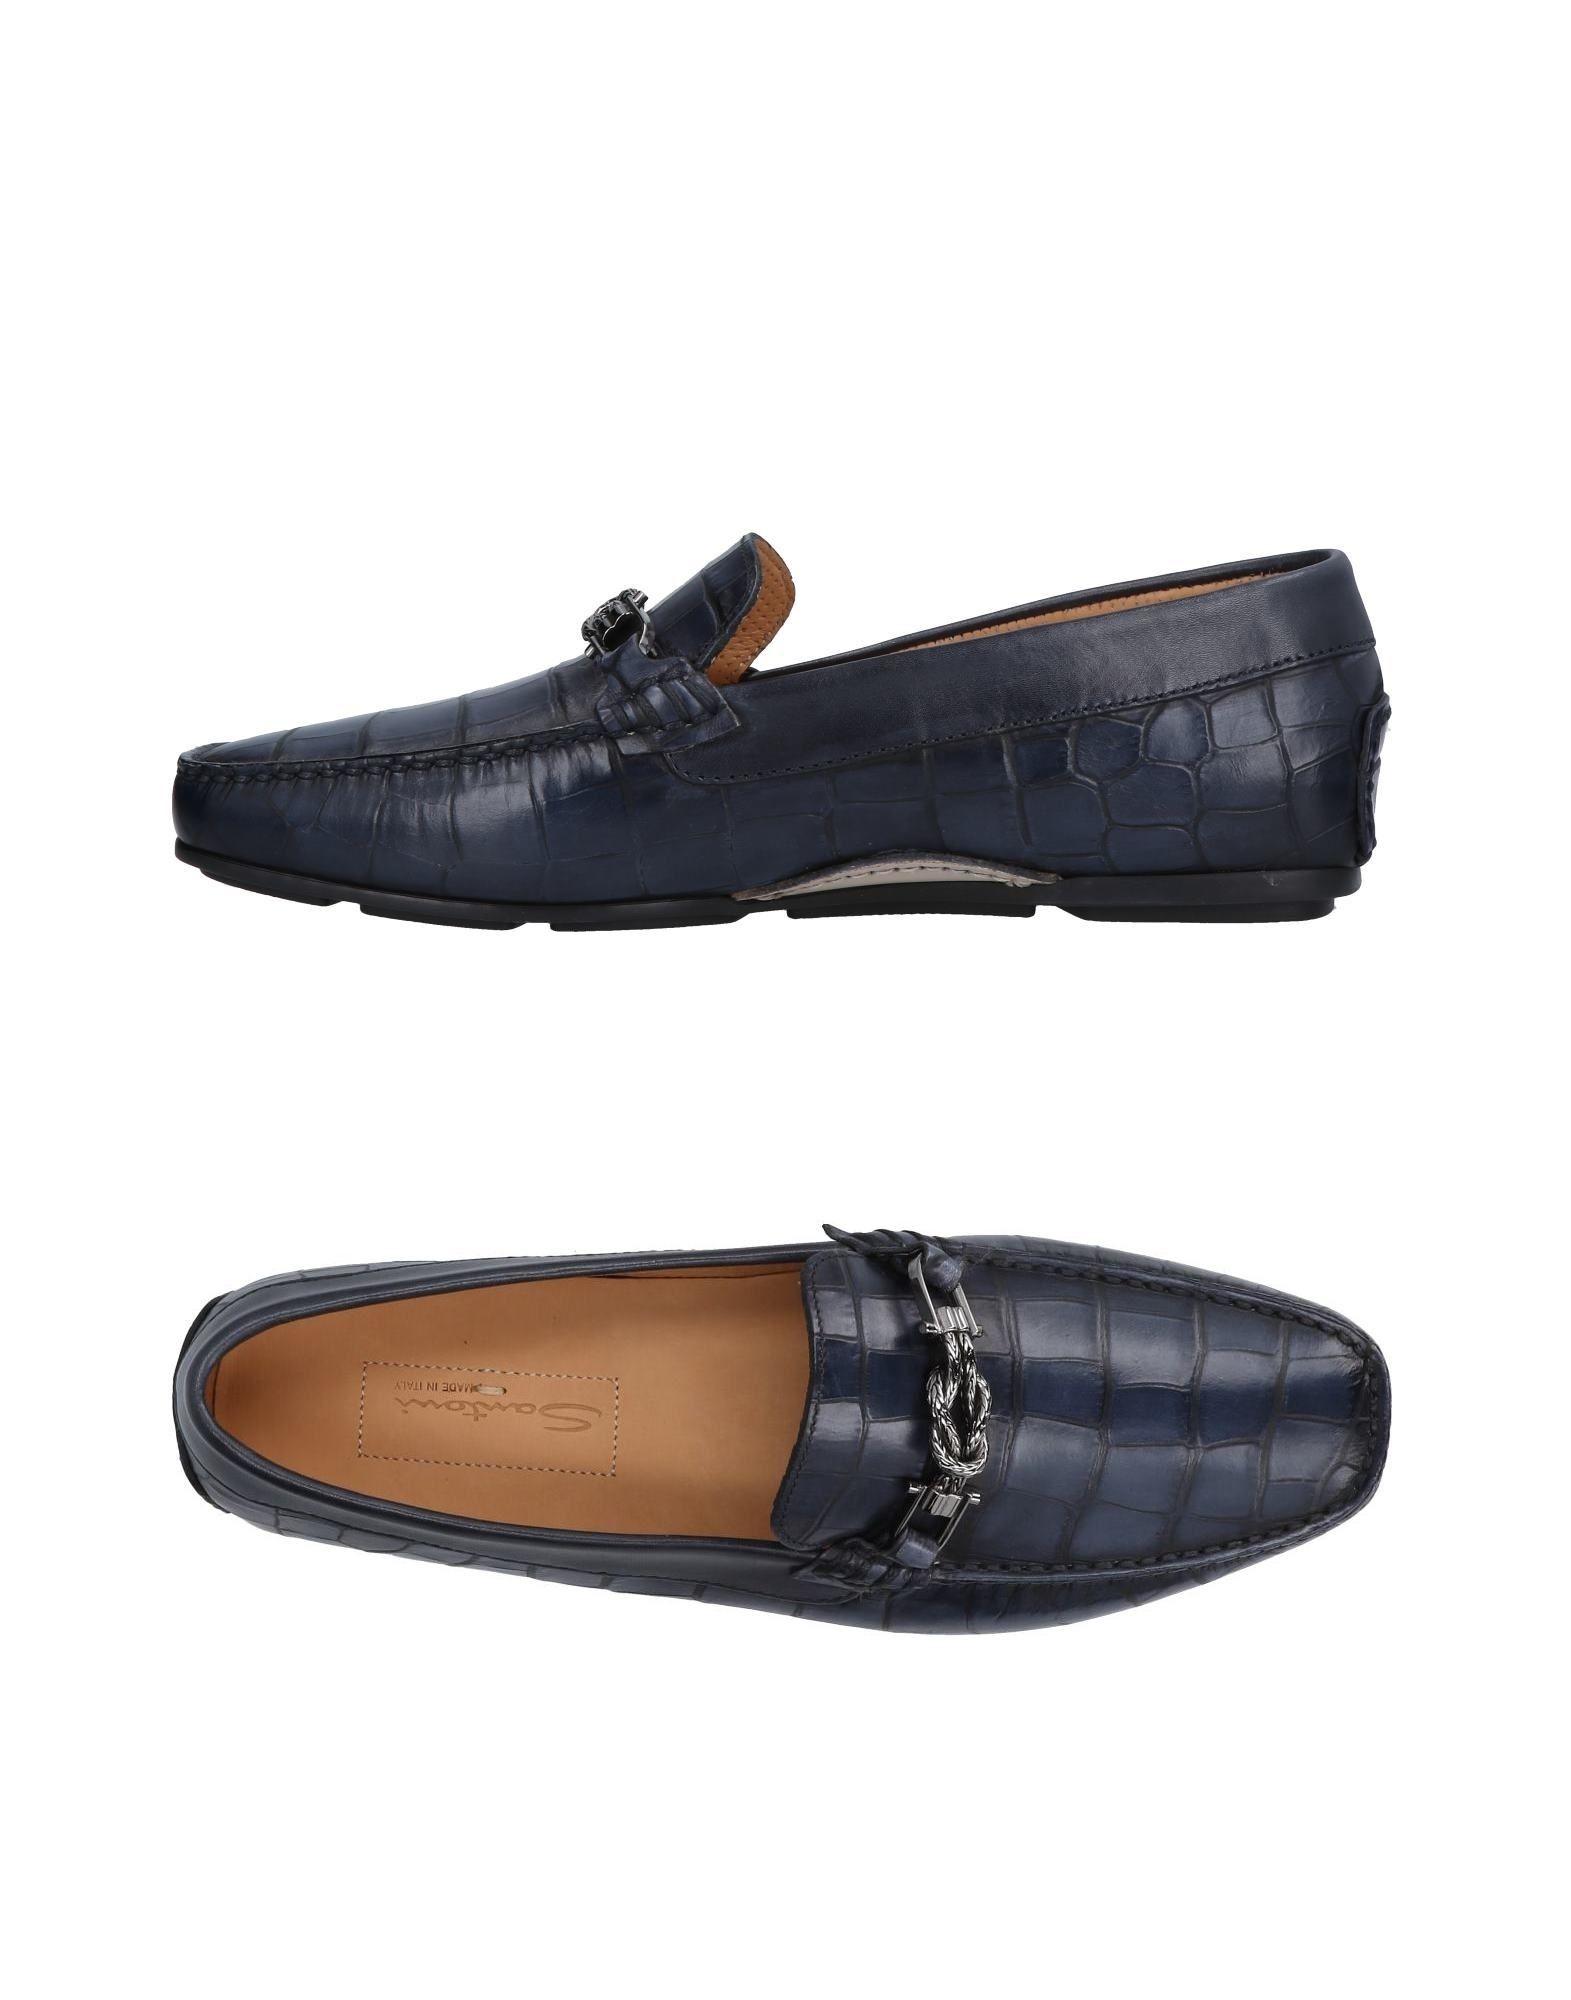 Santoni Mokassins Herren  11478521OT Gute Qualität beliebte Schuhe